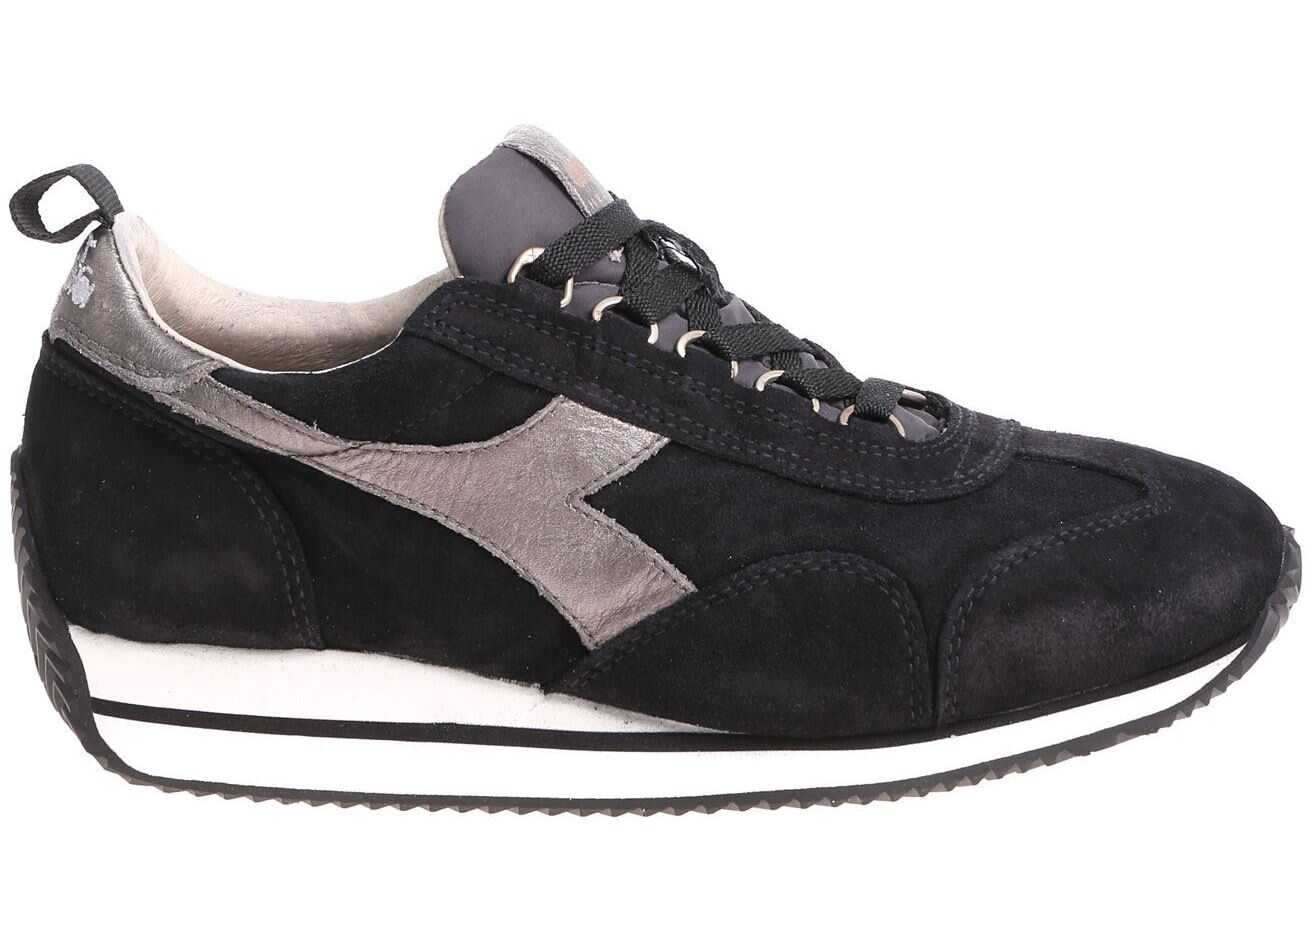 Diadora Heritage Equipe Sw Hh Evo Black Sneakers Black